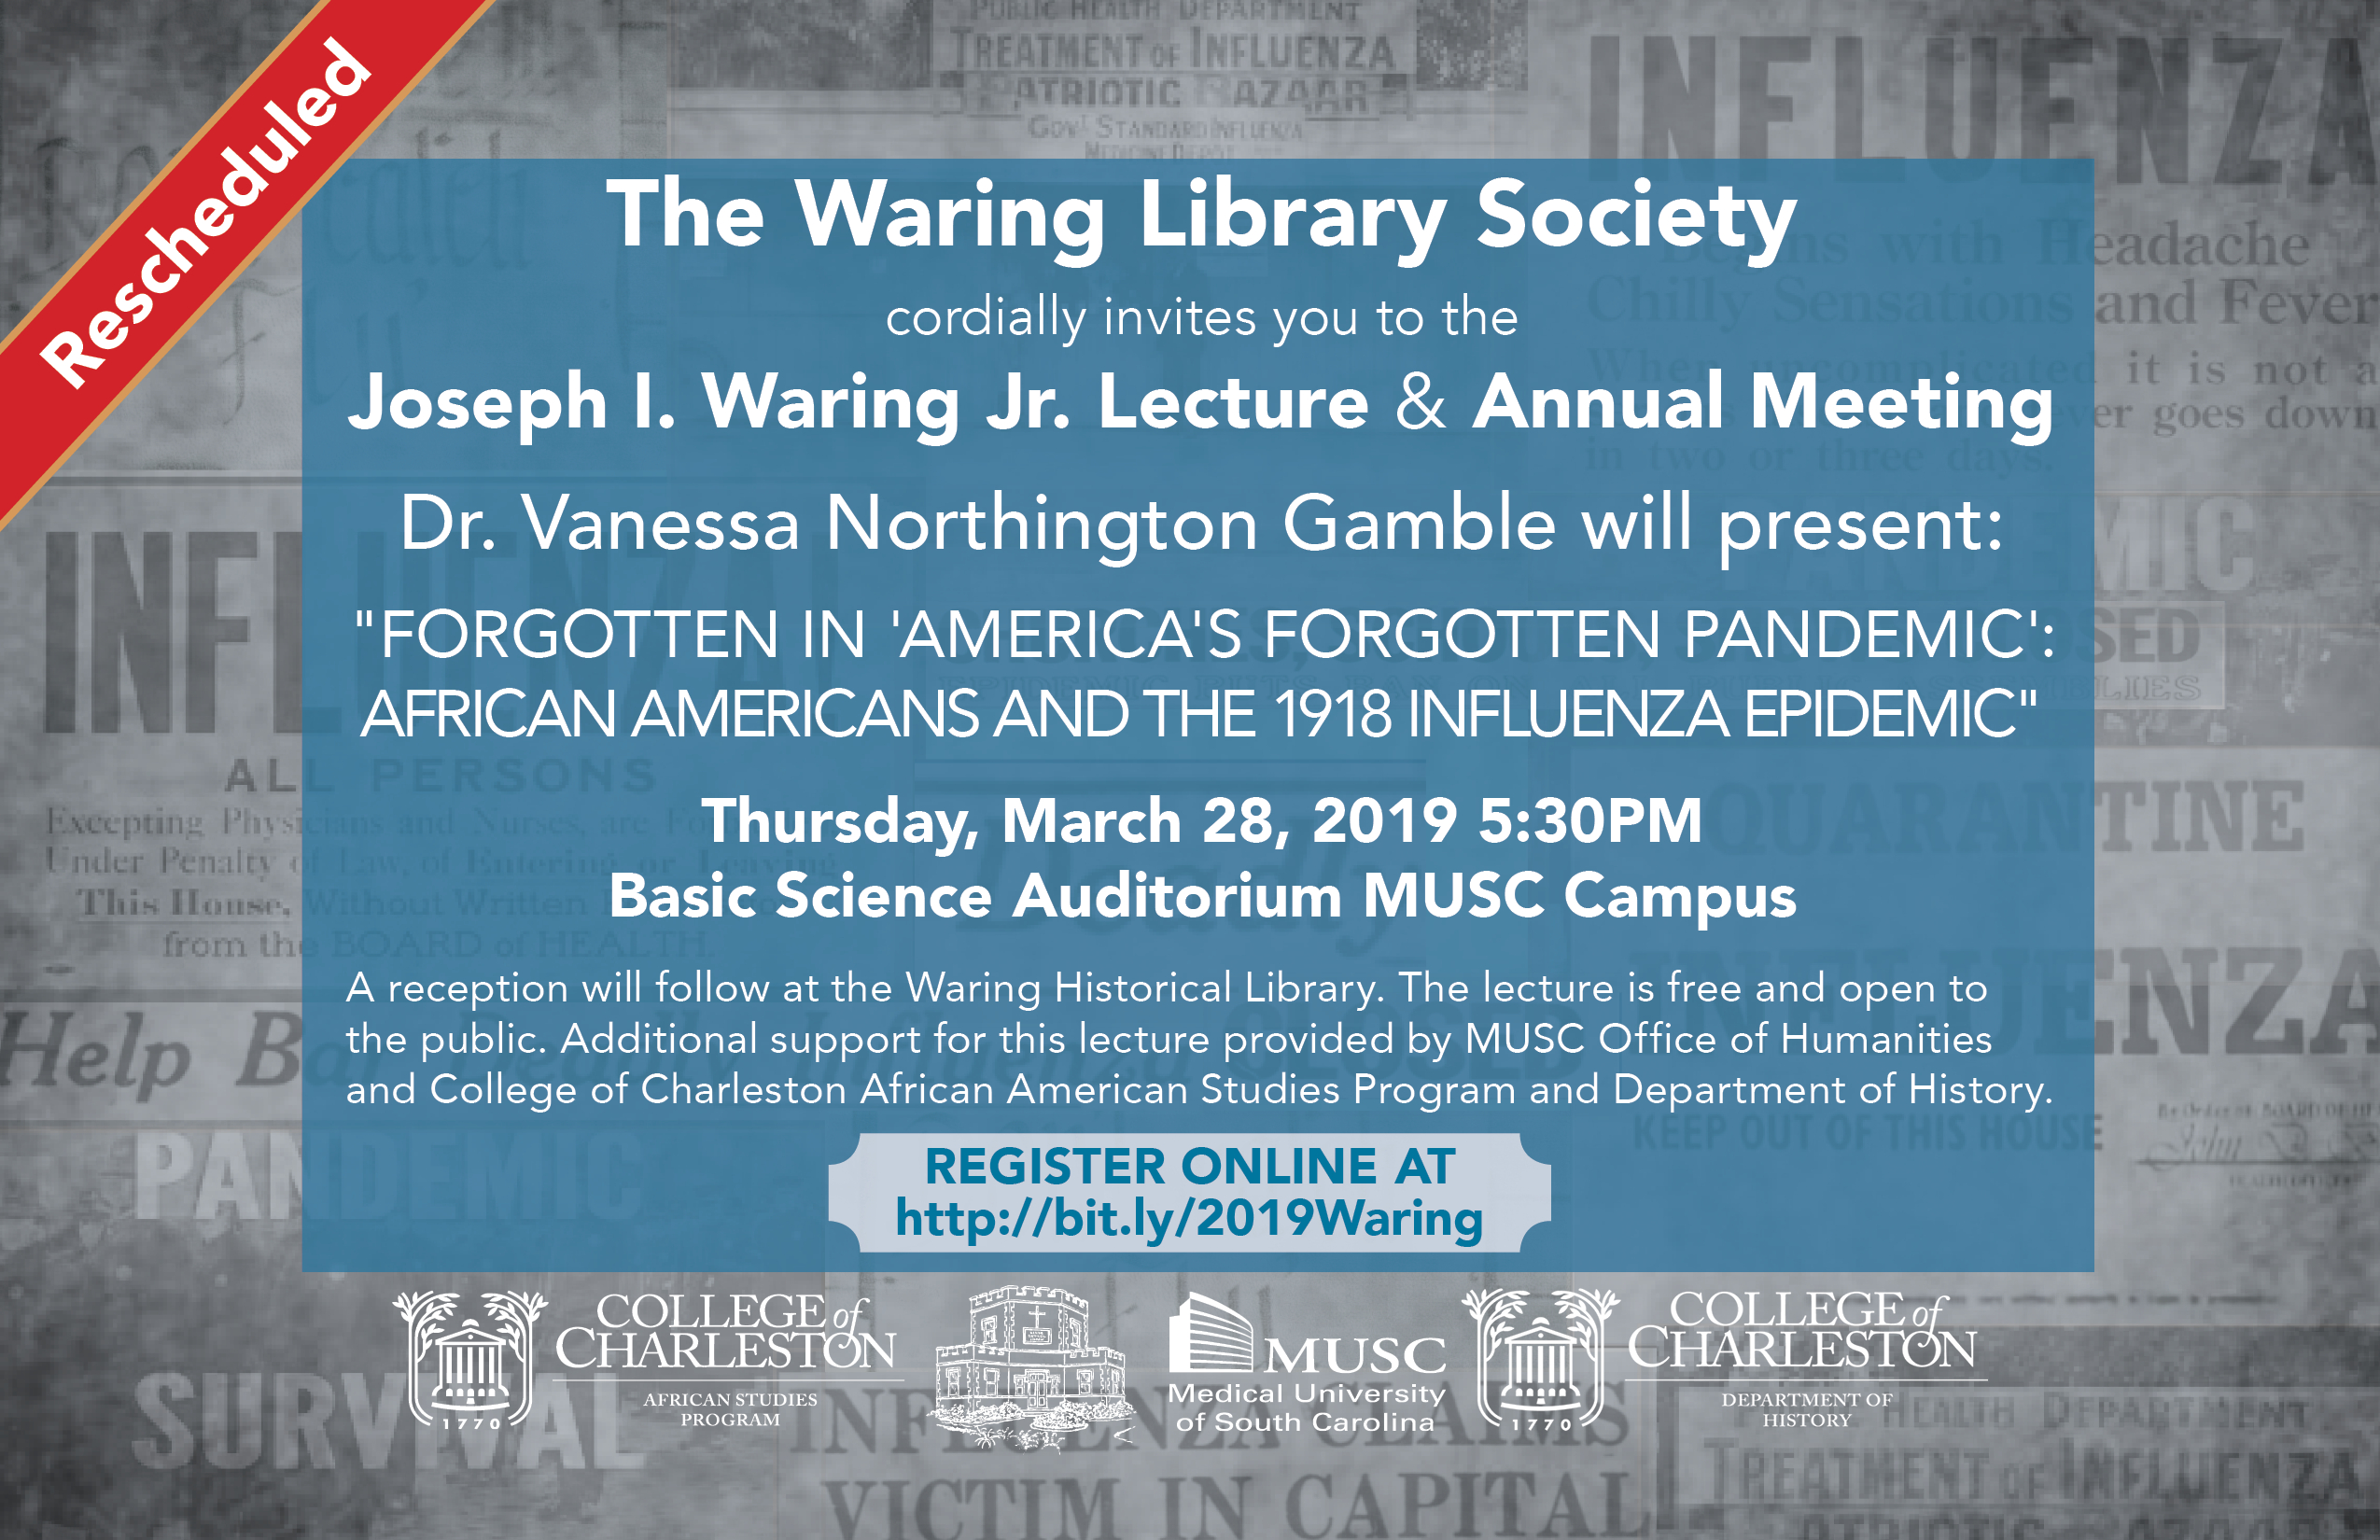 Joseph I. Waring Jr. Lecture & Reception